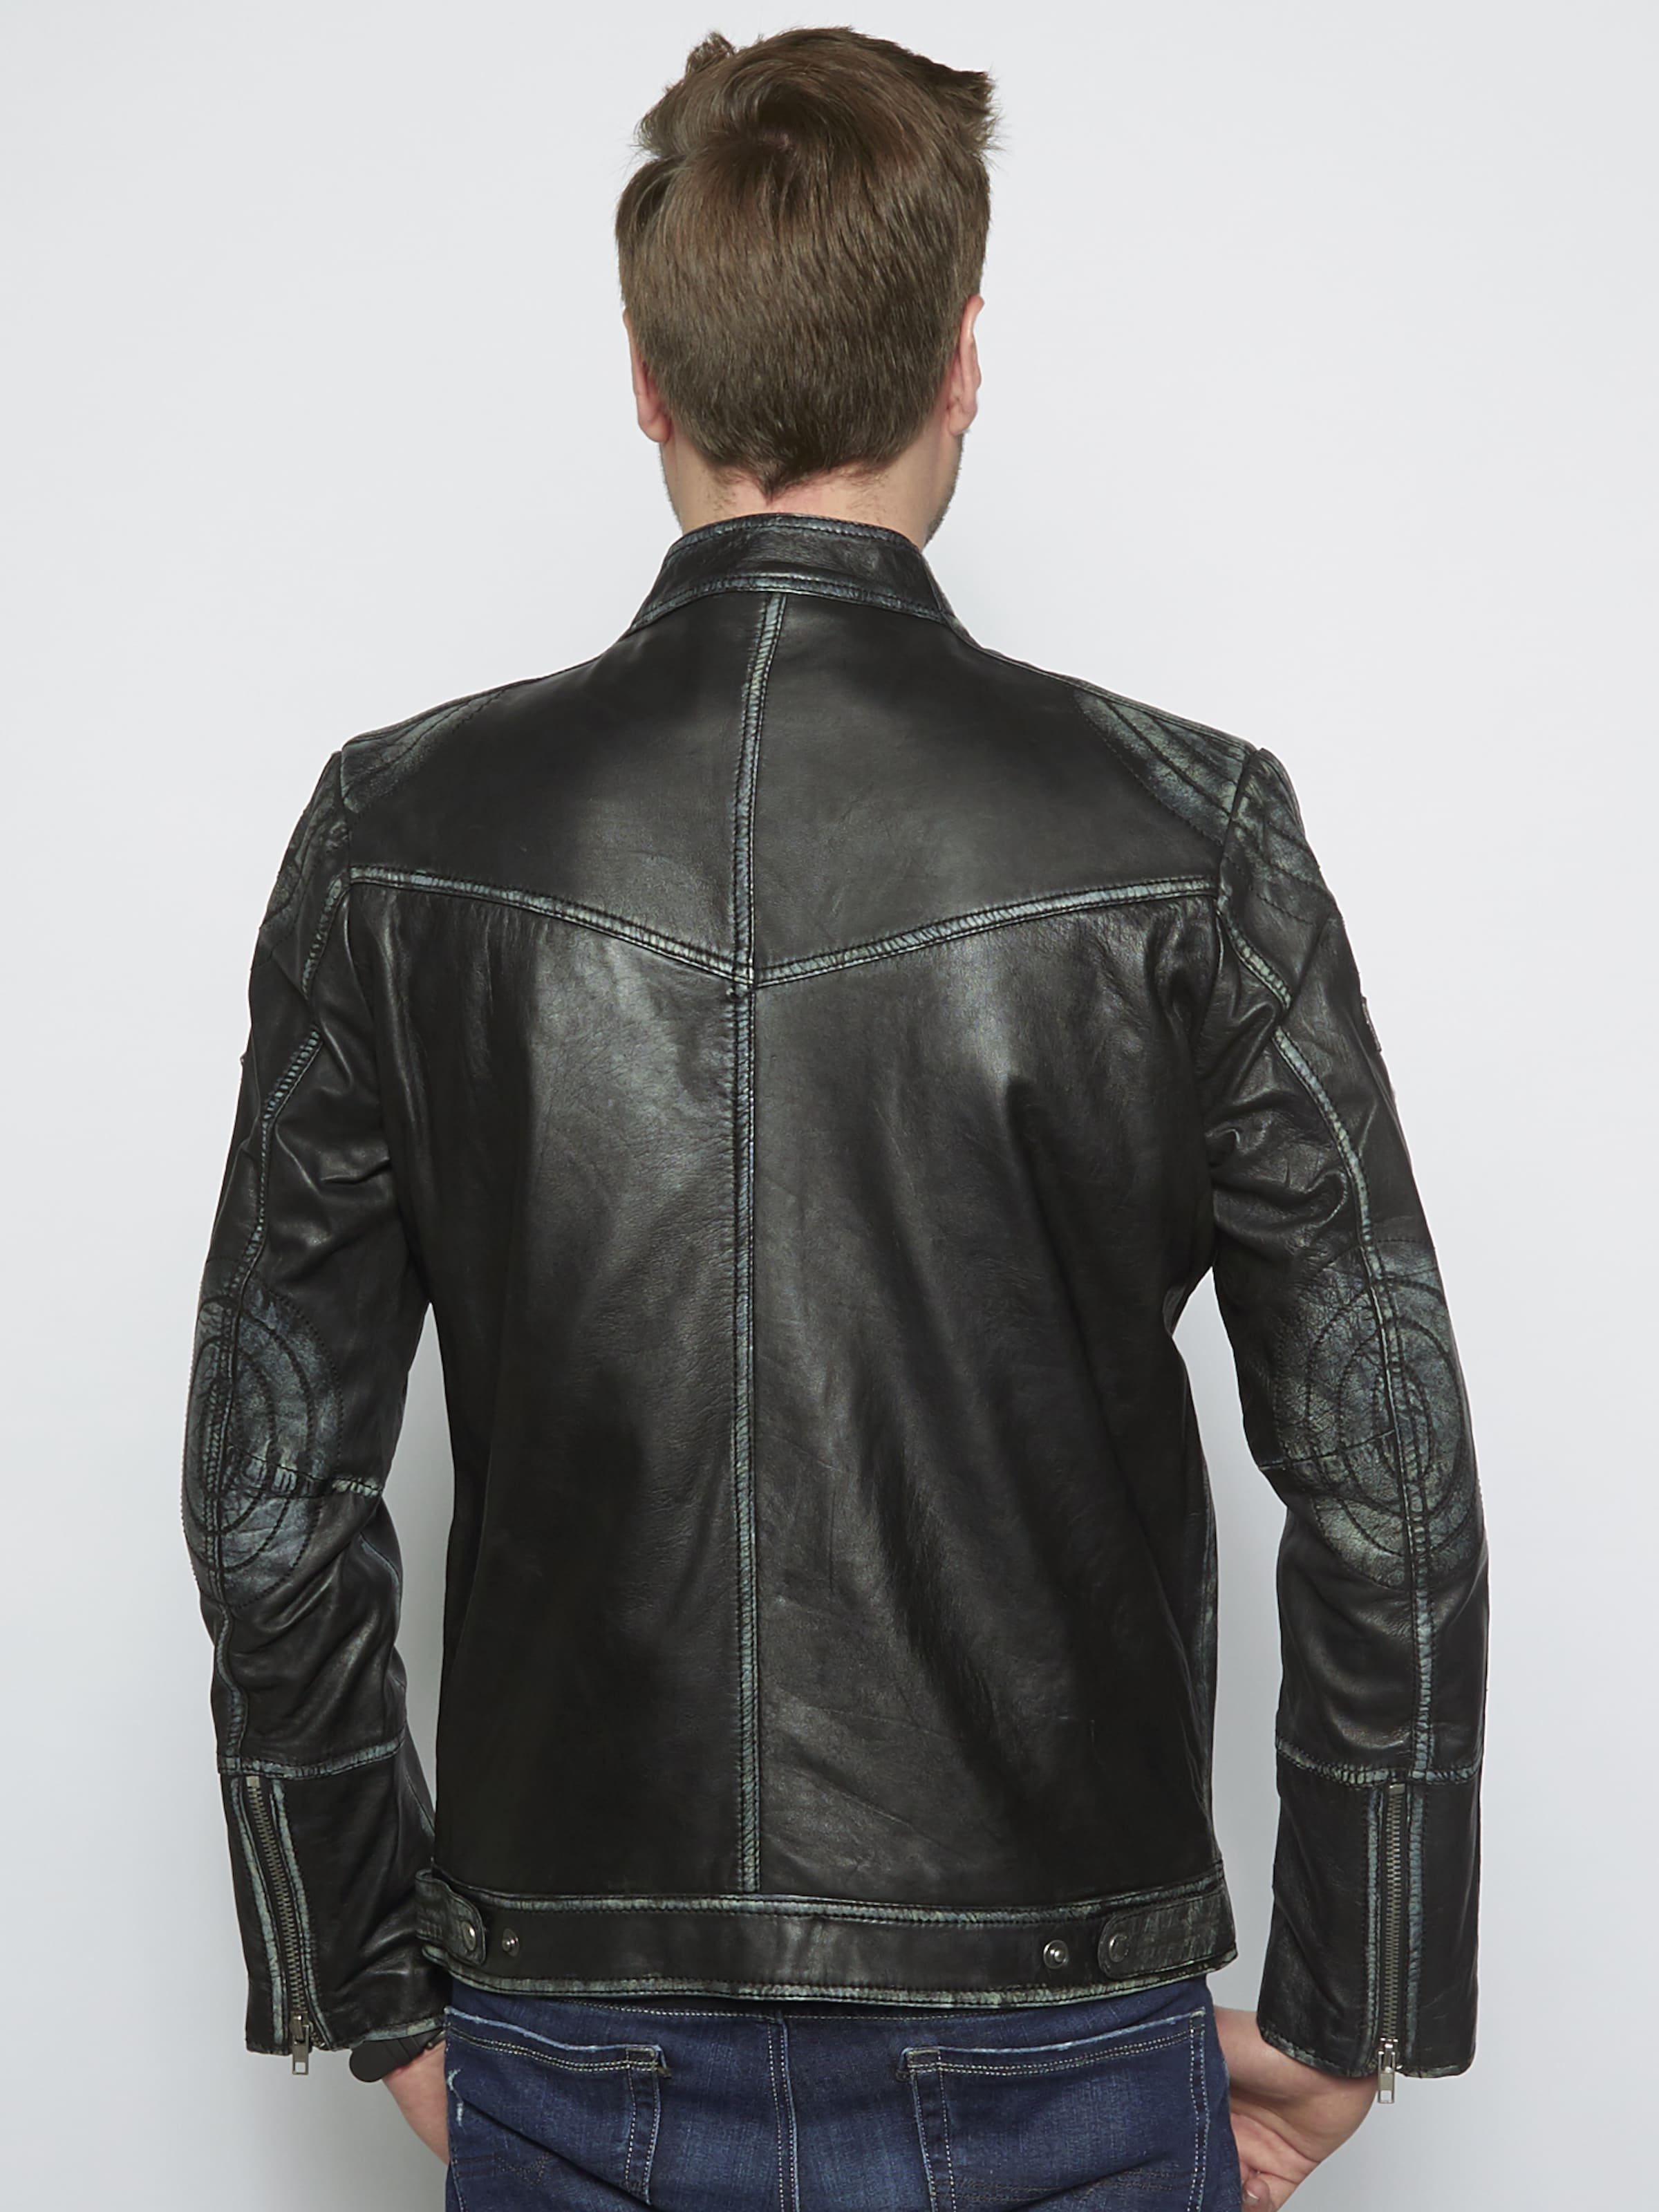 'uwe ' Schwarz In Mustang Lederjacke bv7Yfy6g